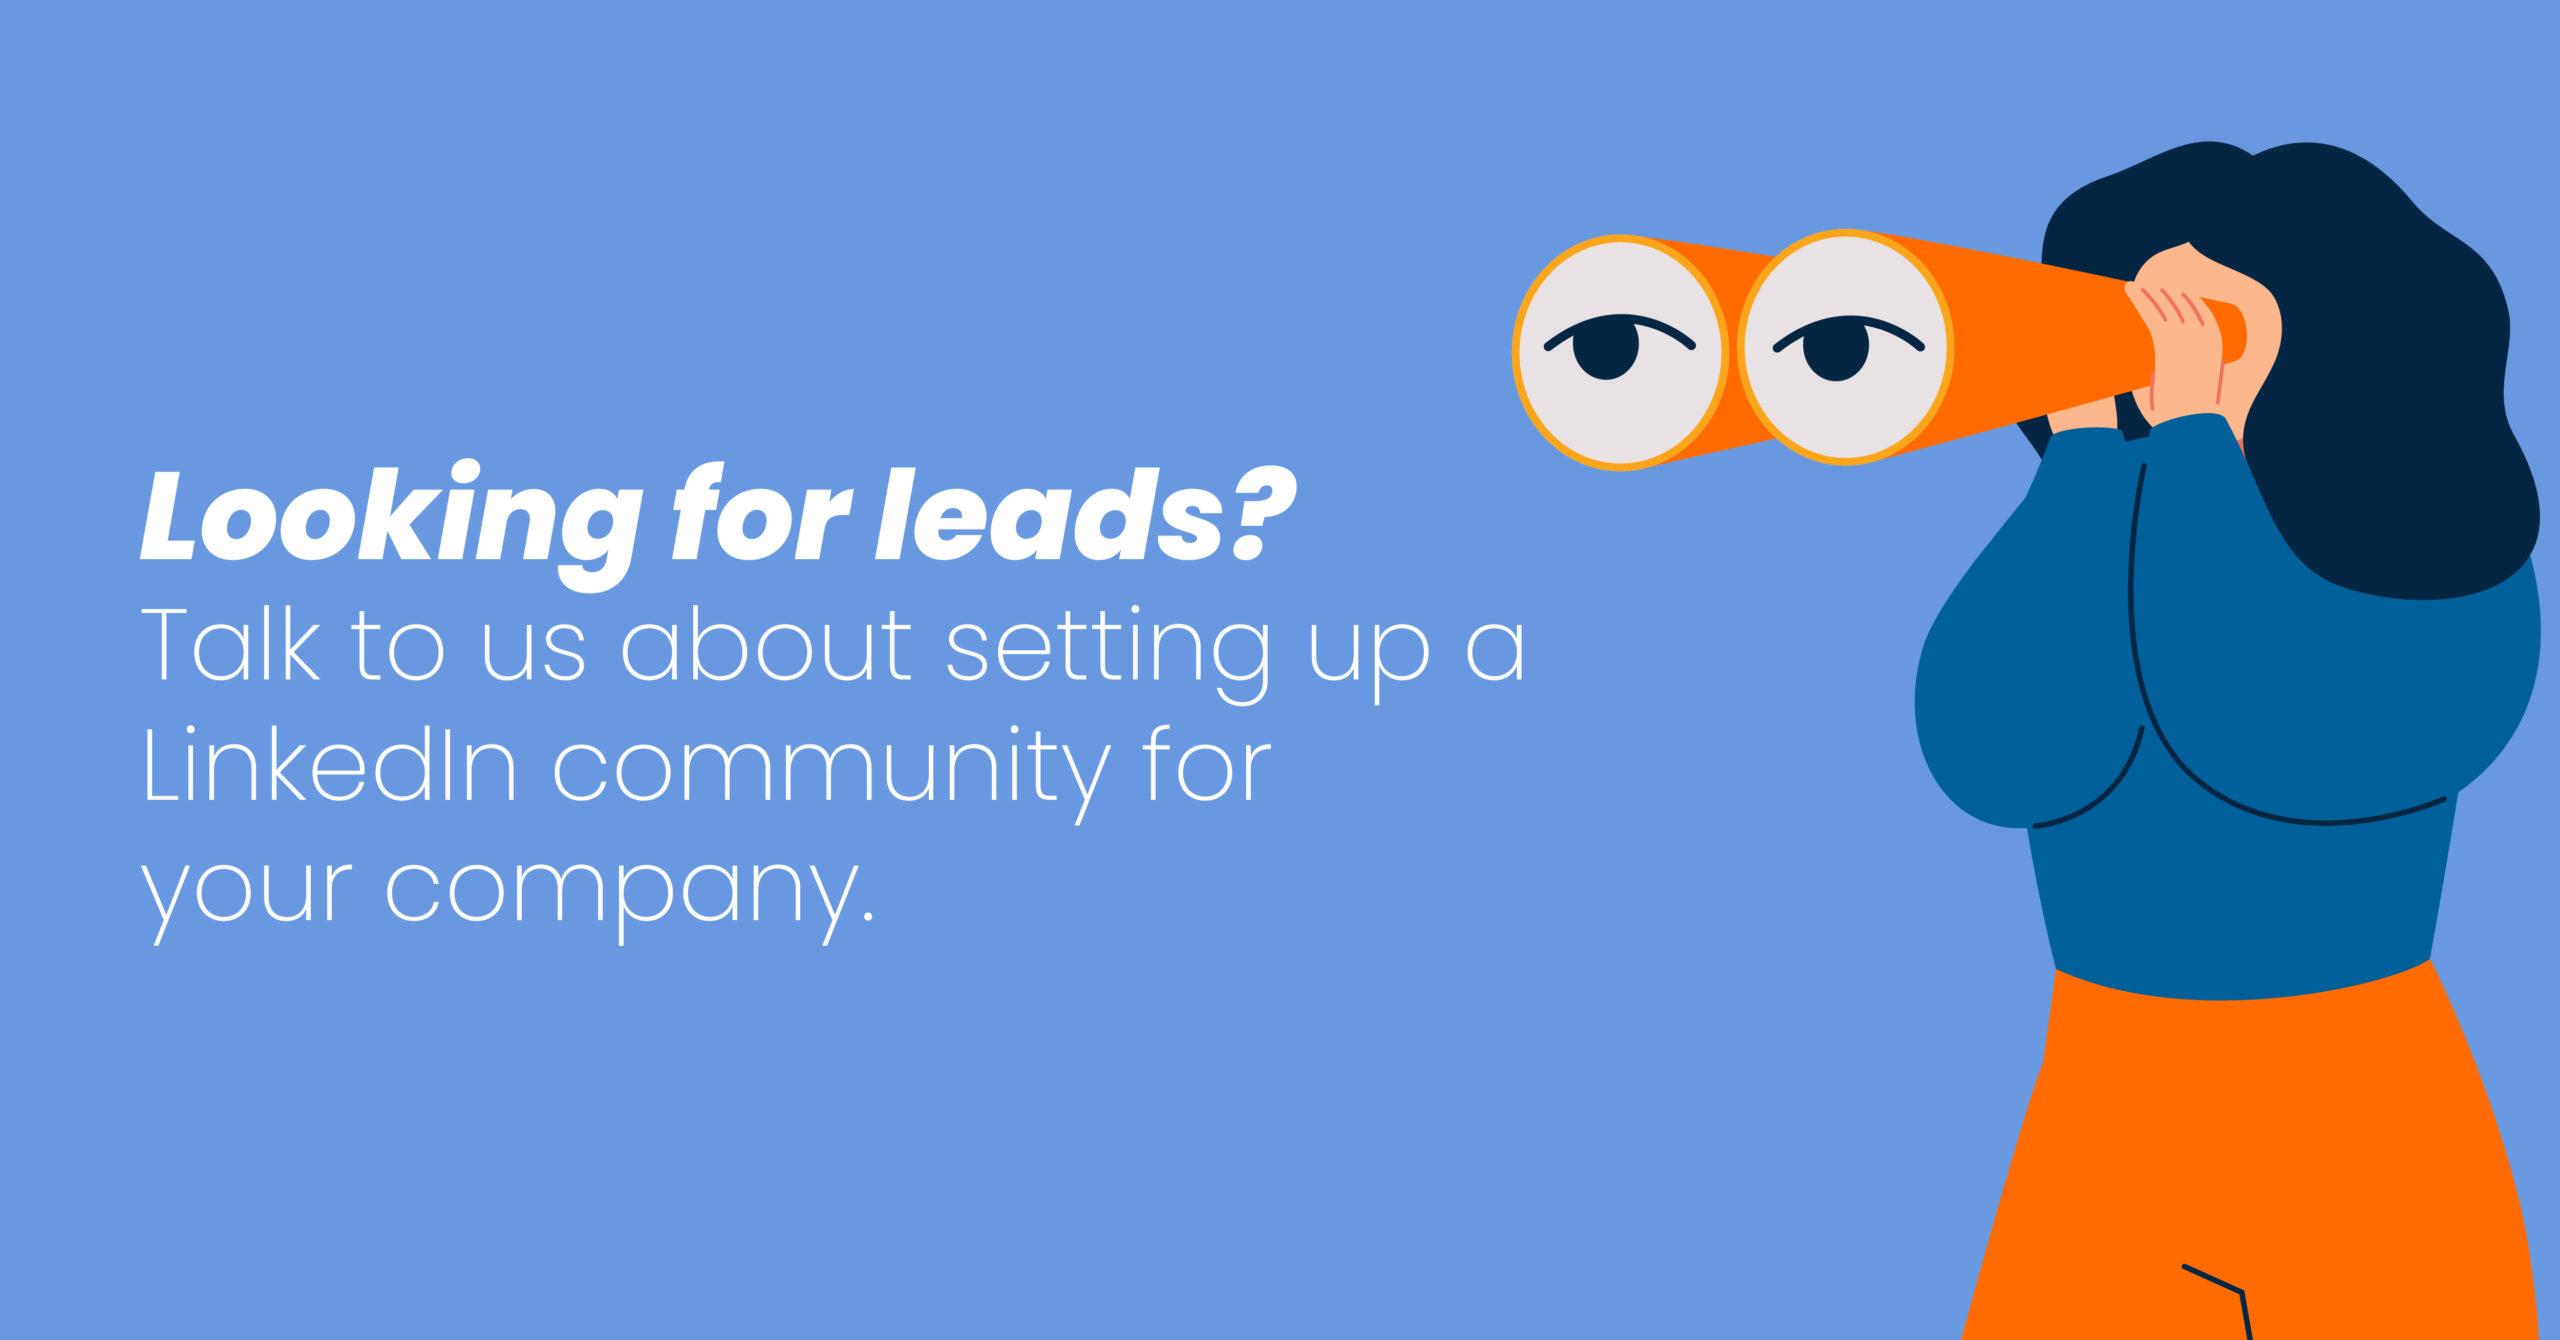 Setup a Linkedin Community for your company